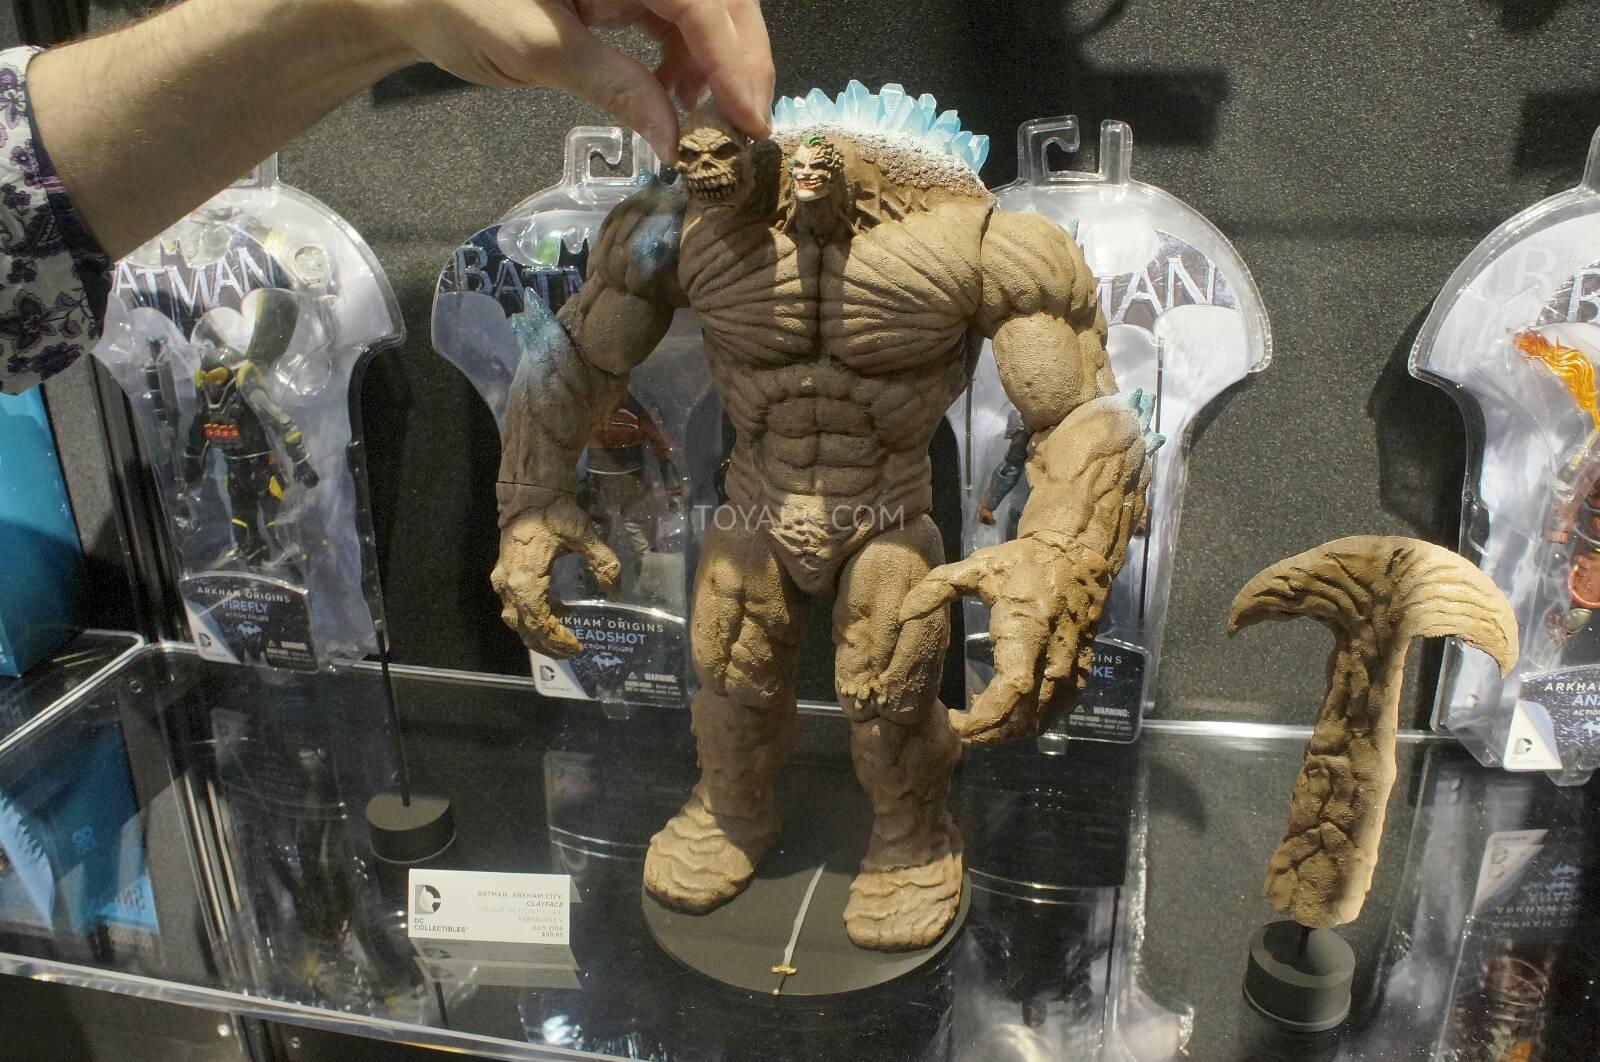 [Toy Fair 2014] DC Collectibles Toy-Fair-2014-DC-Collectibles-156